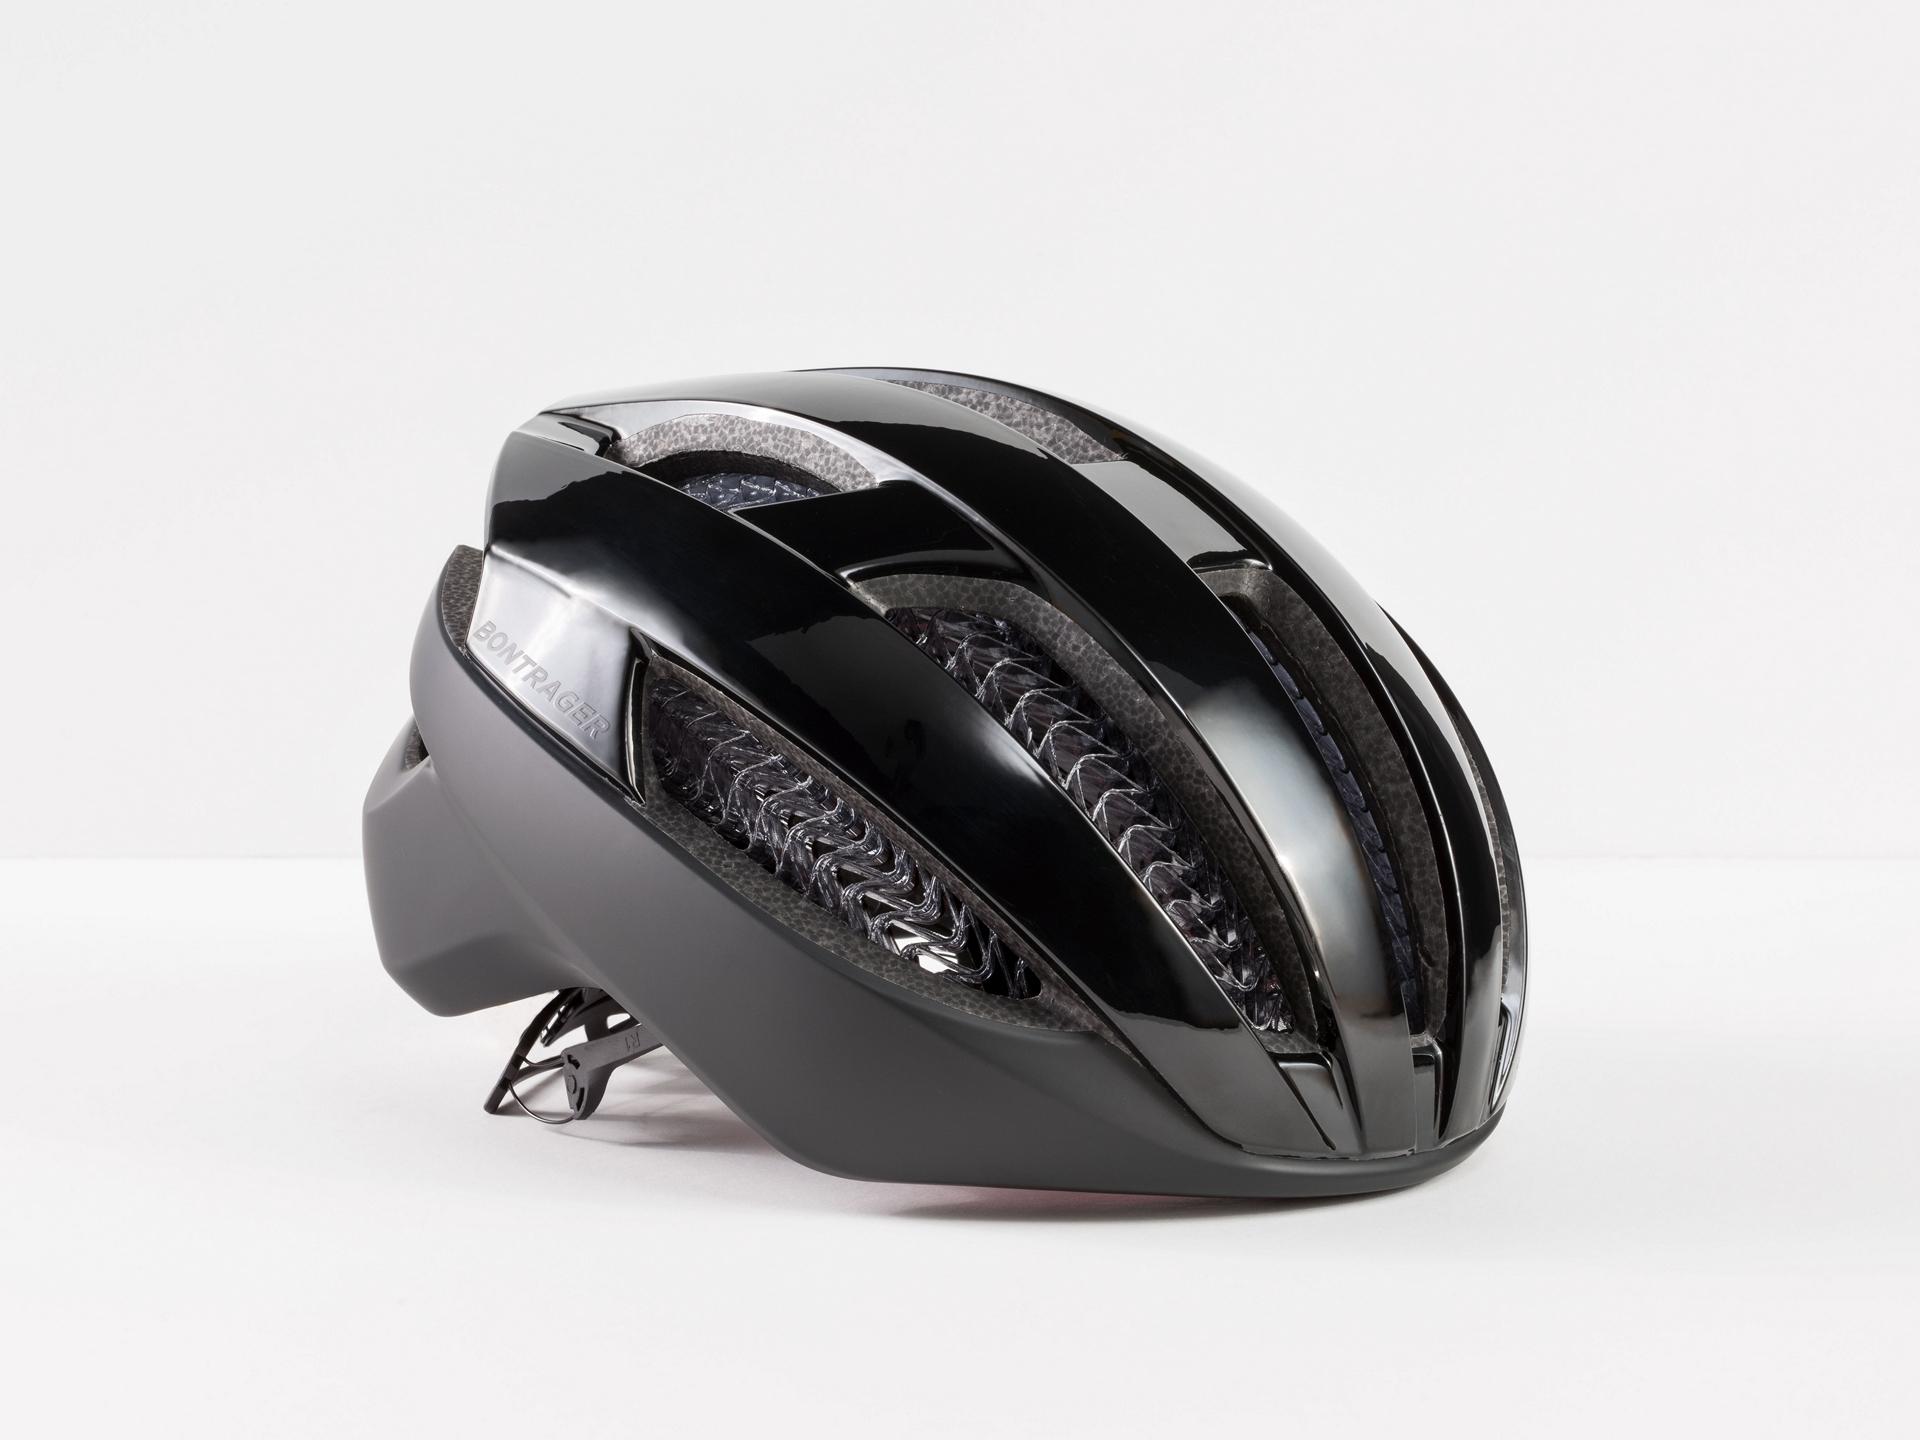 Bontrager Specter WaveCel Helmet CPSC